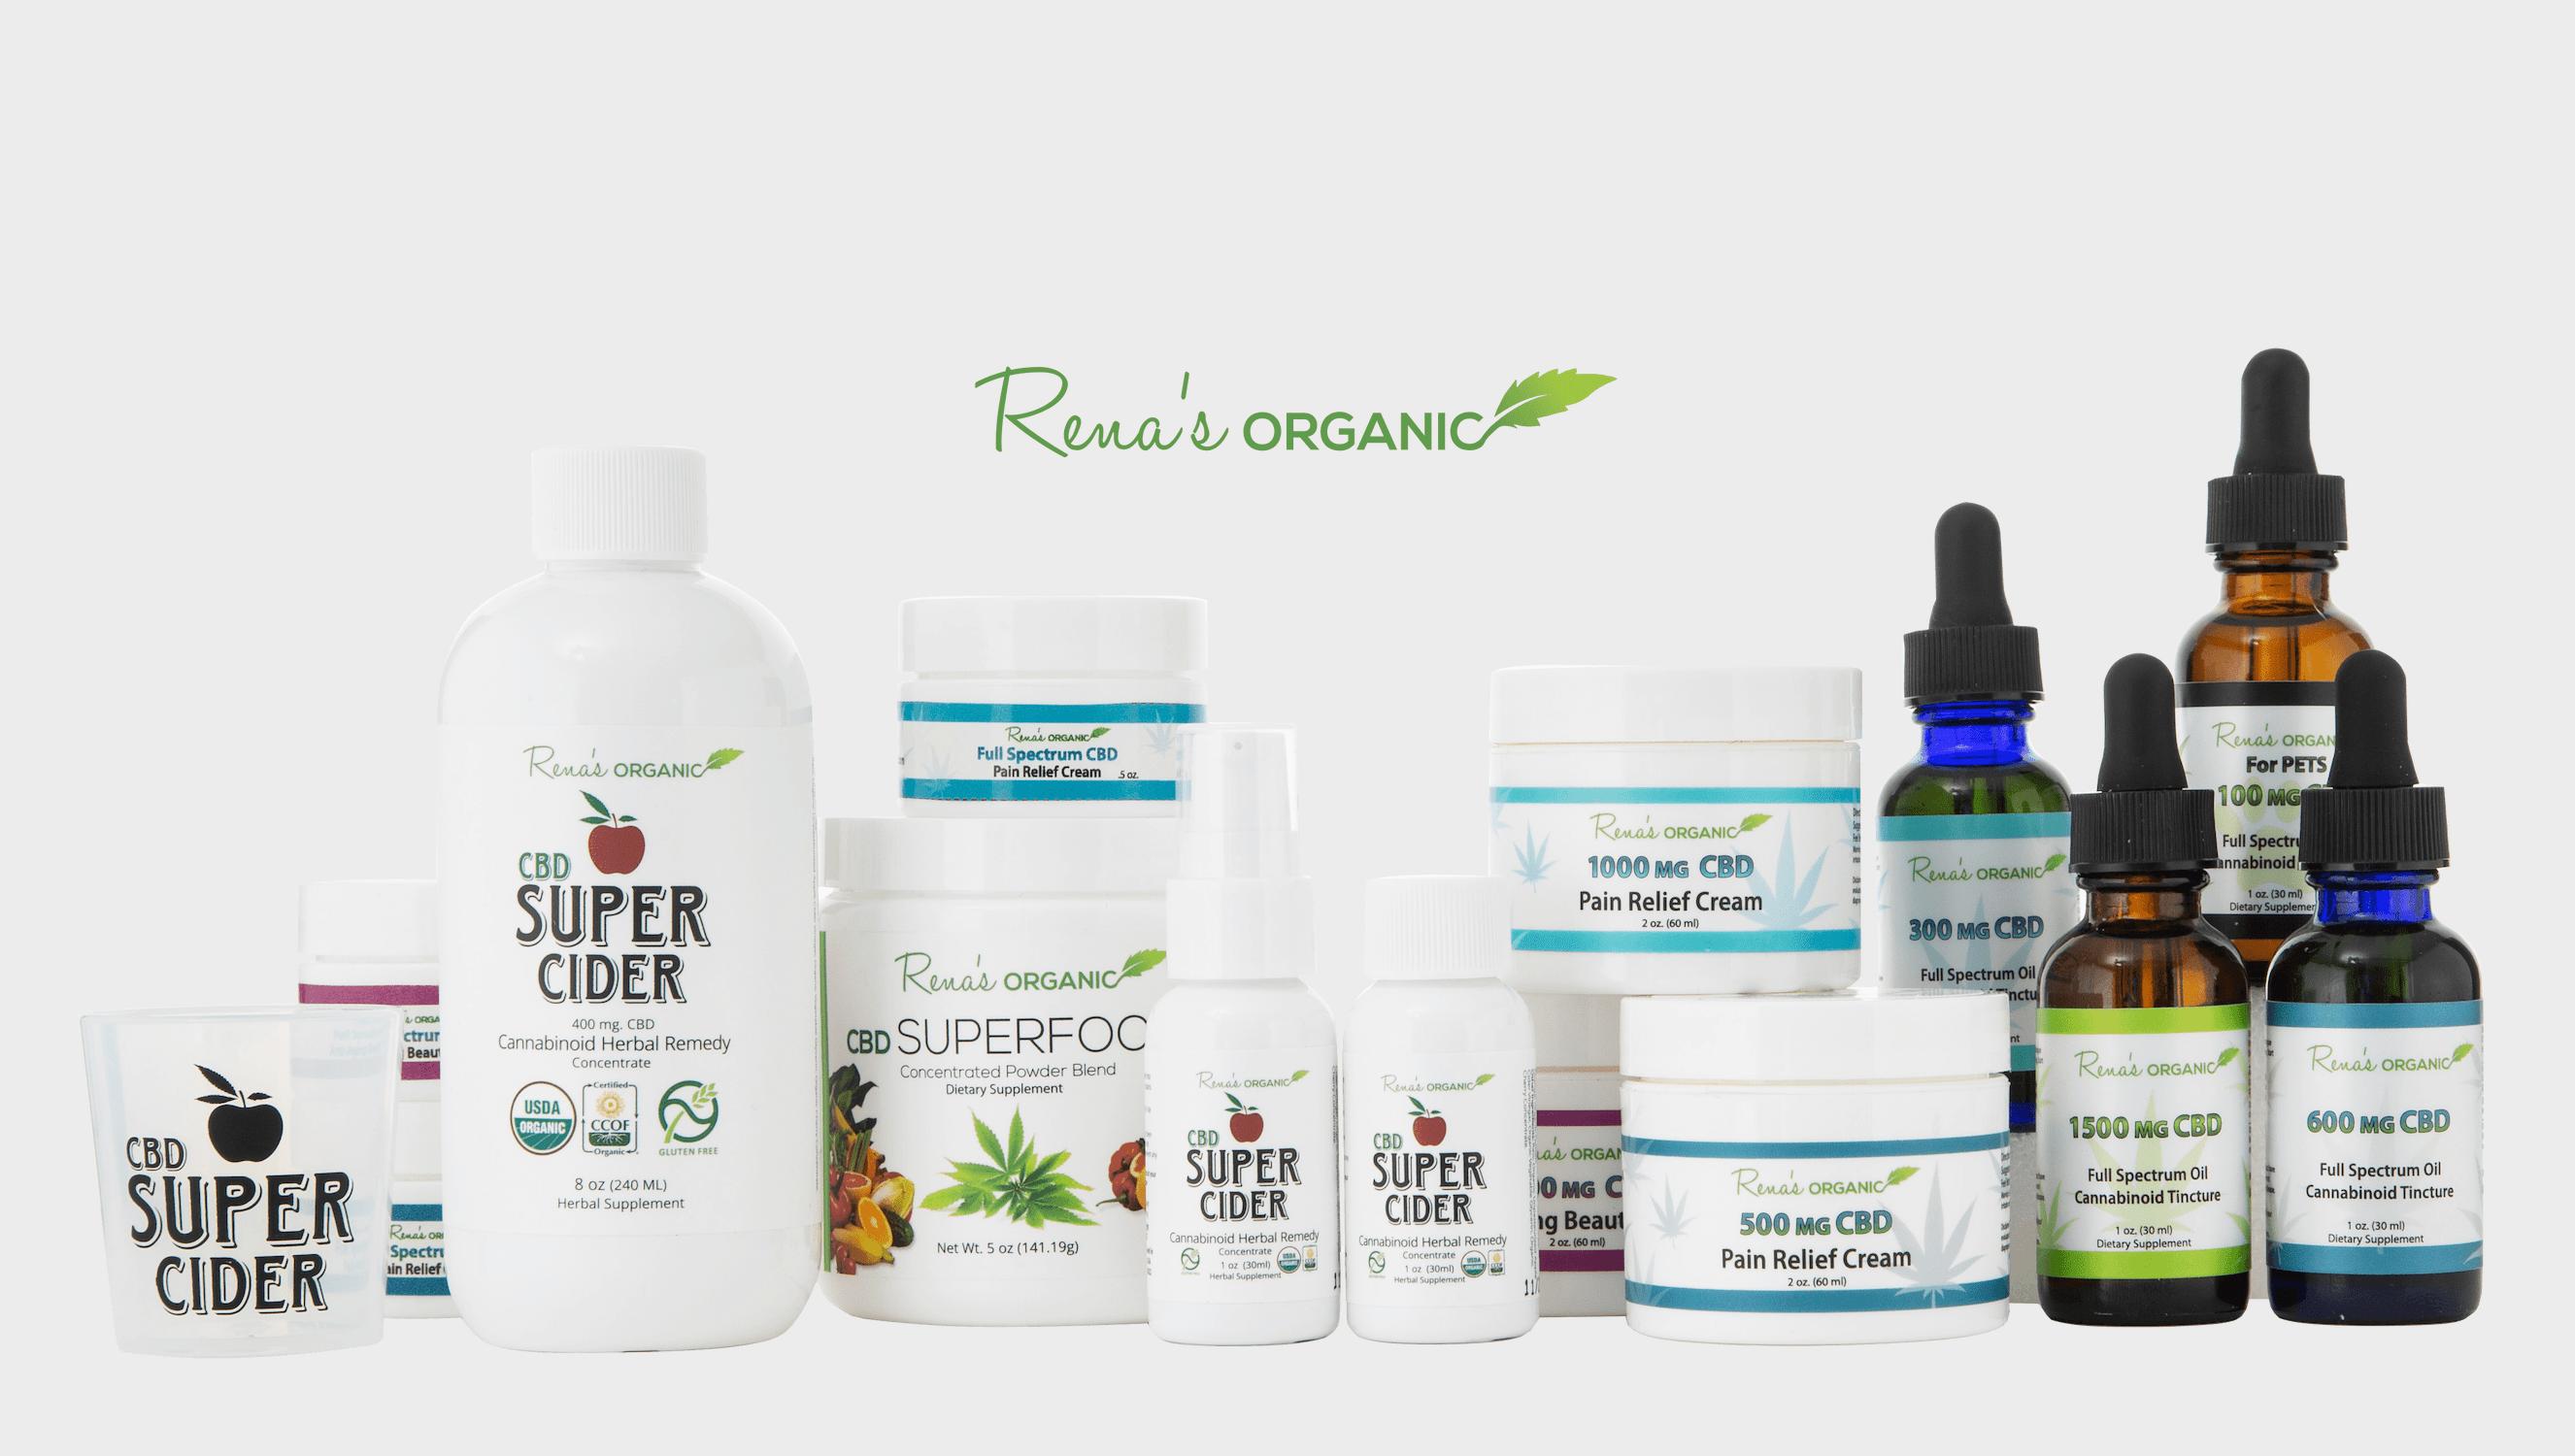 Rena's Organic CBD products